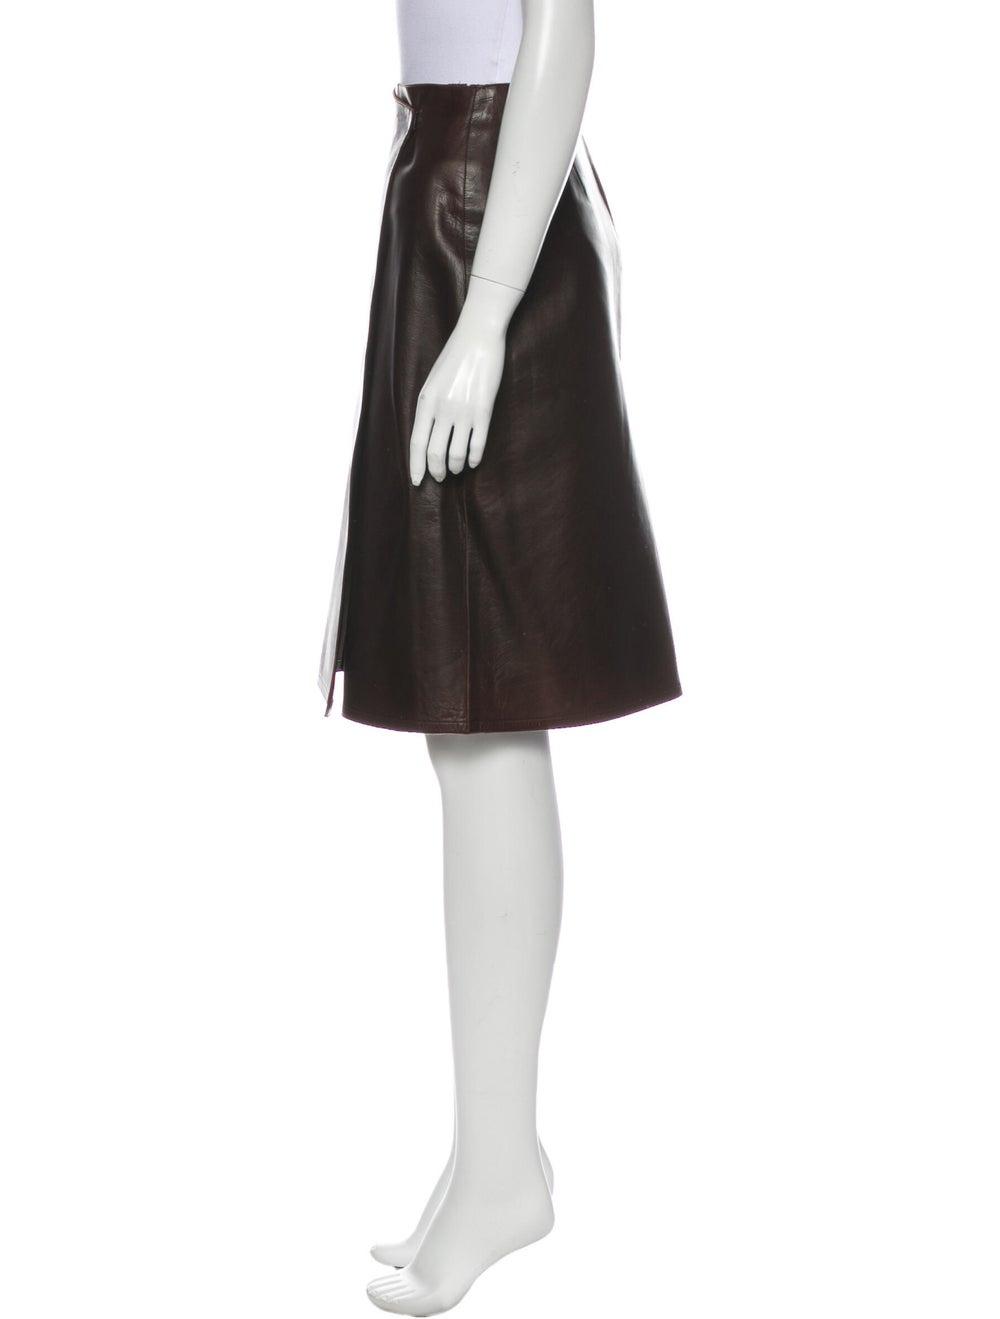 Chanel Vintage Knee-Length Skirt Brown - image 2